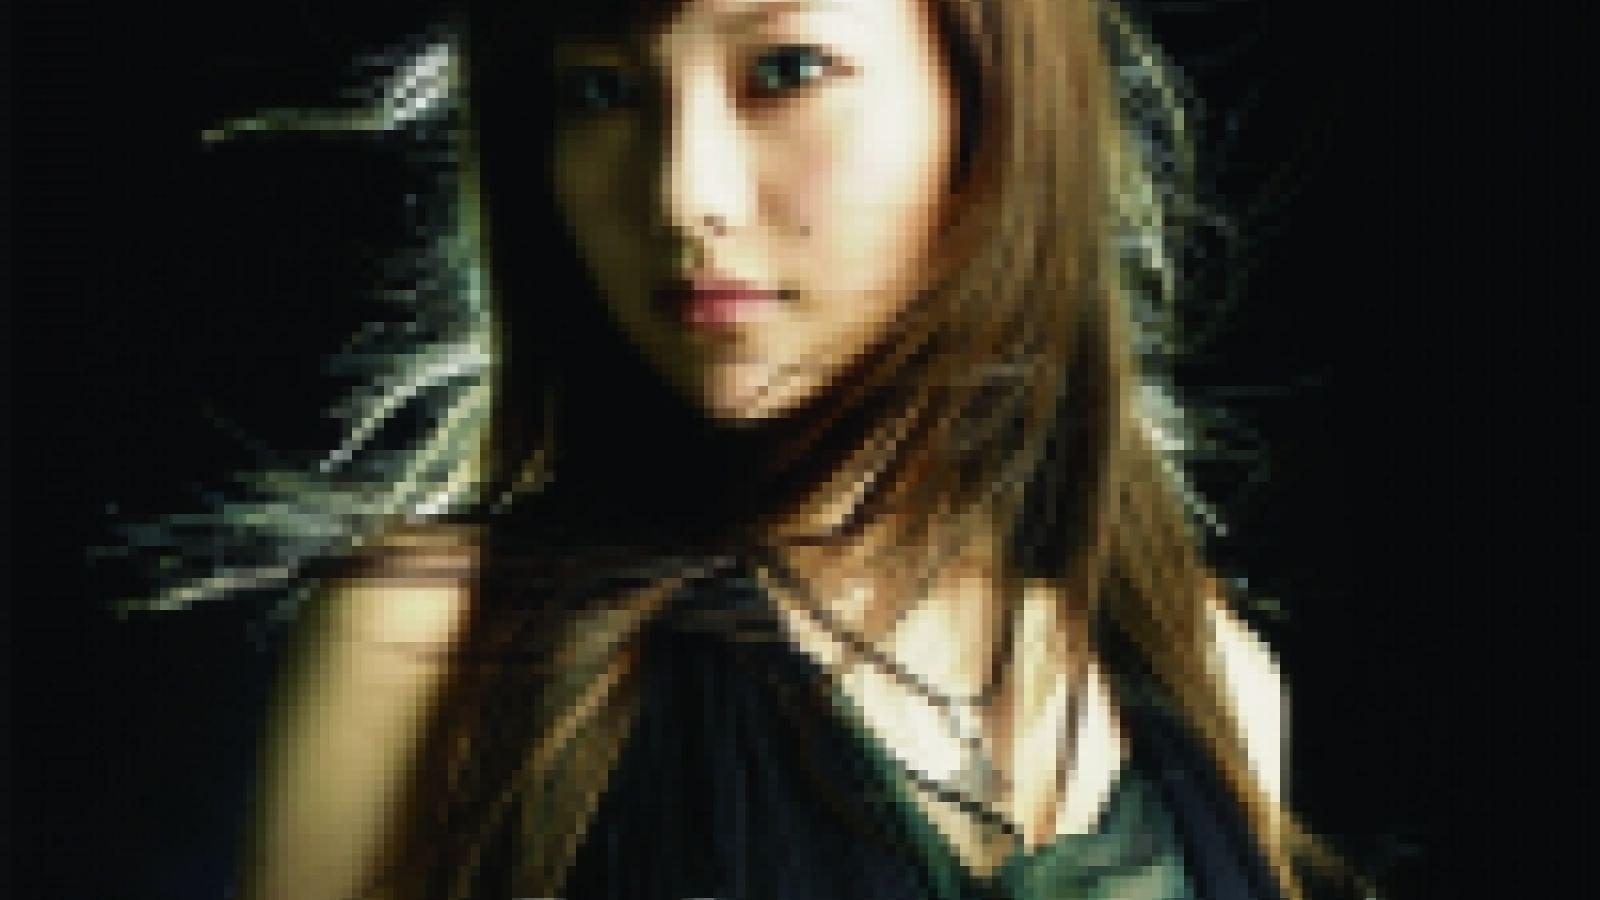 Tanimura Nana - Say Good-bye © Avex Entertainment Inc.